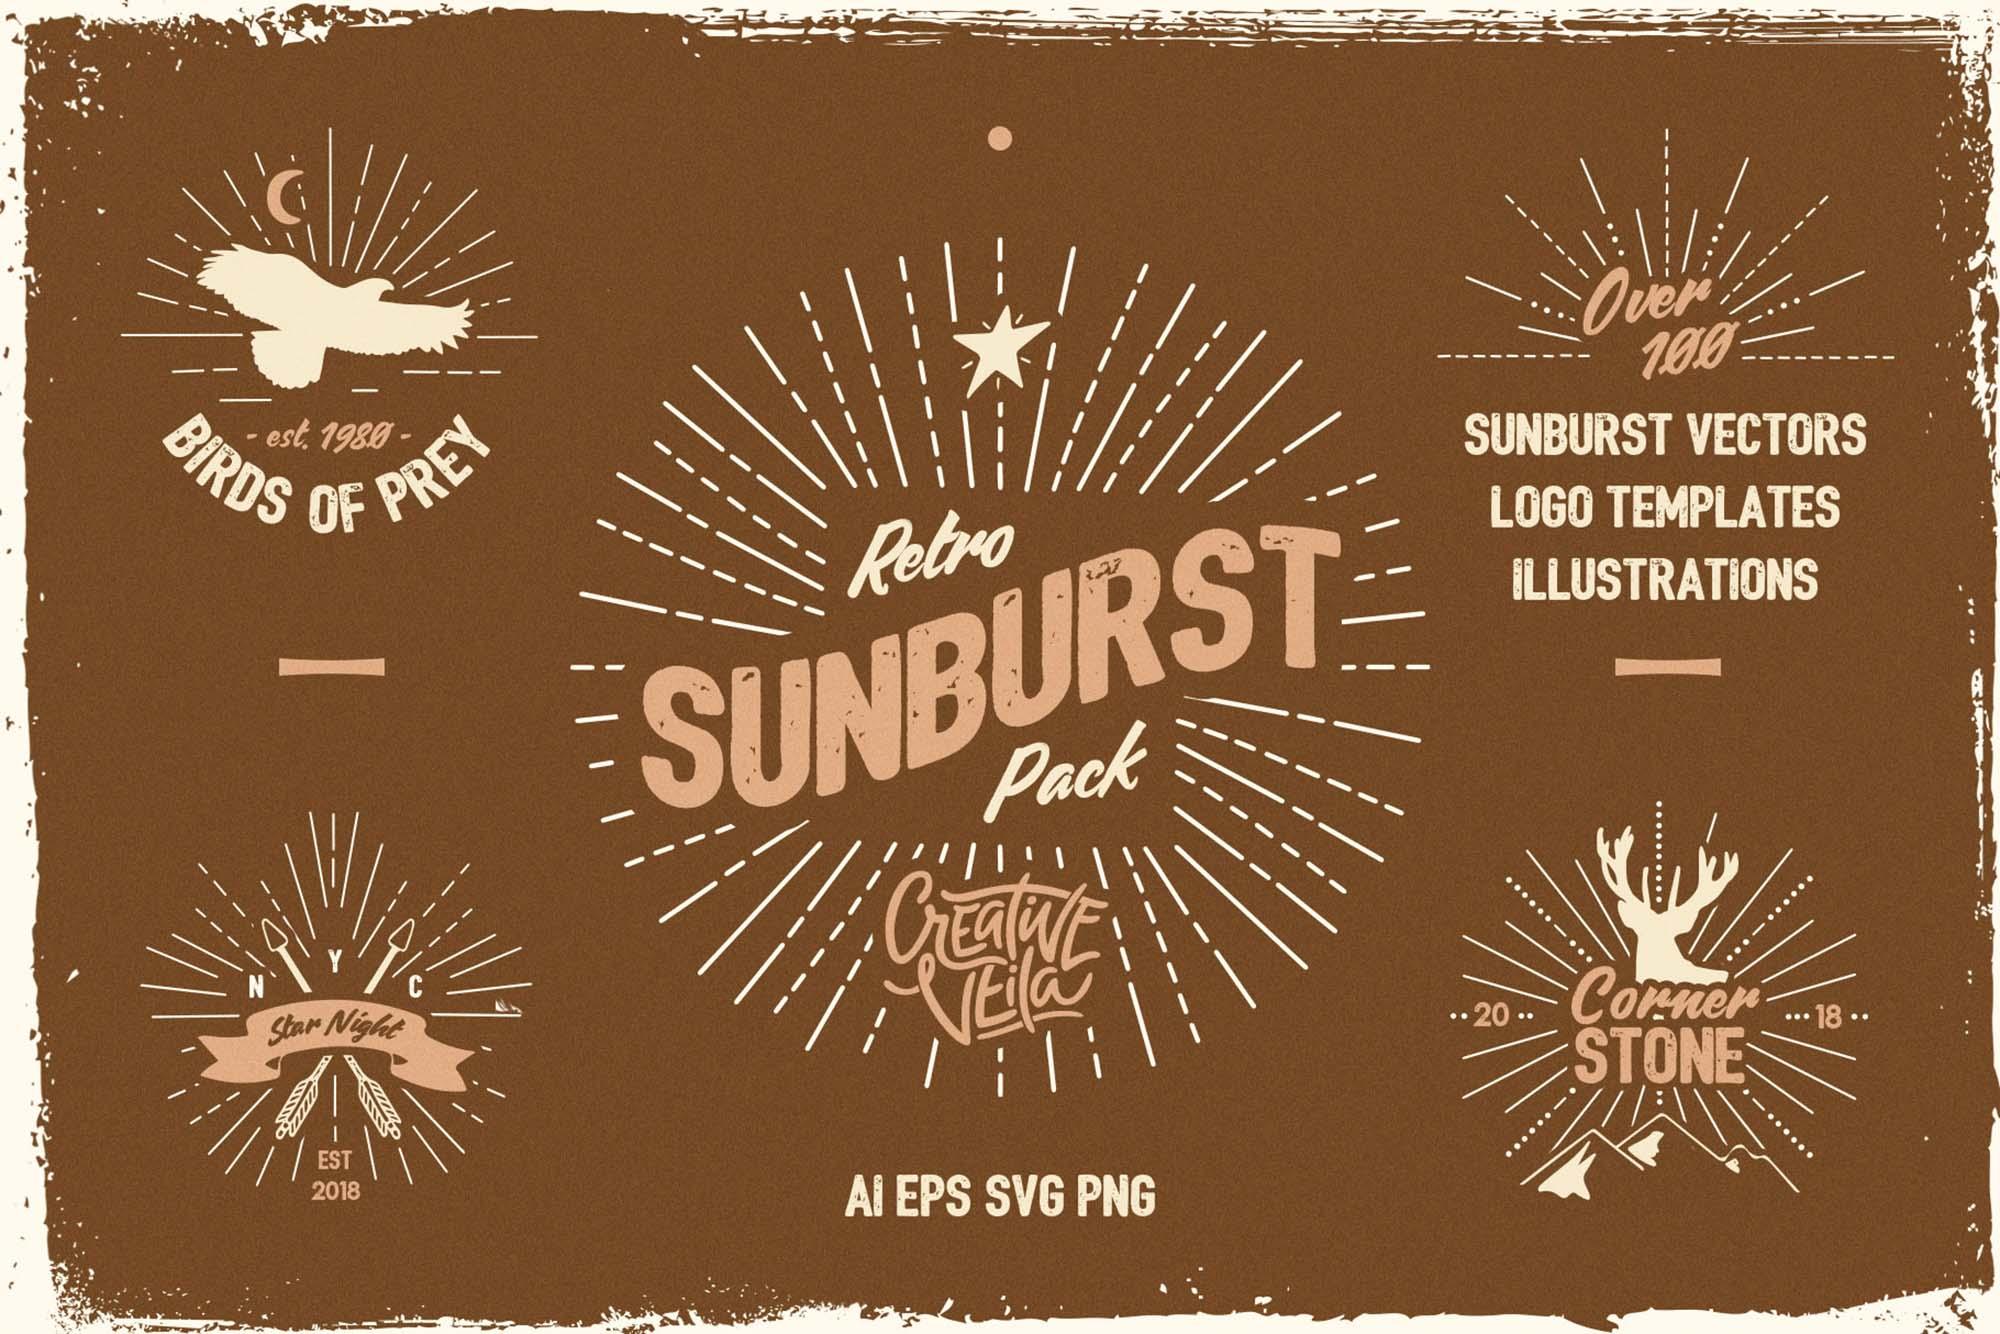 Sunburst Vectors